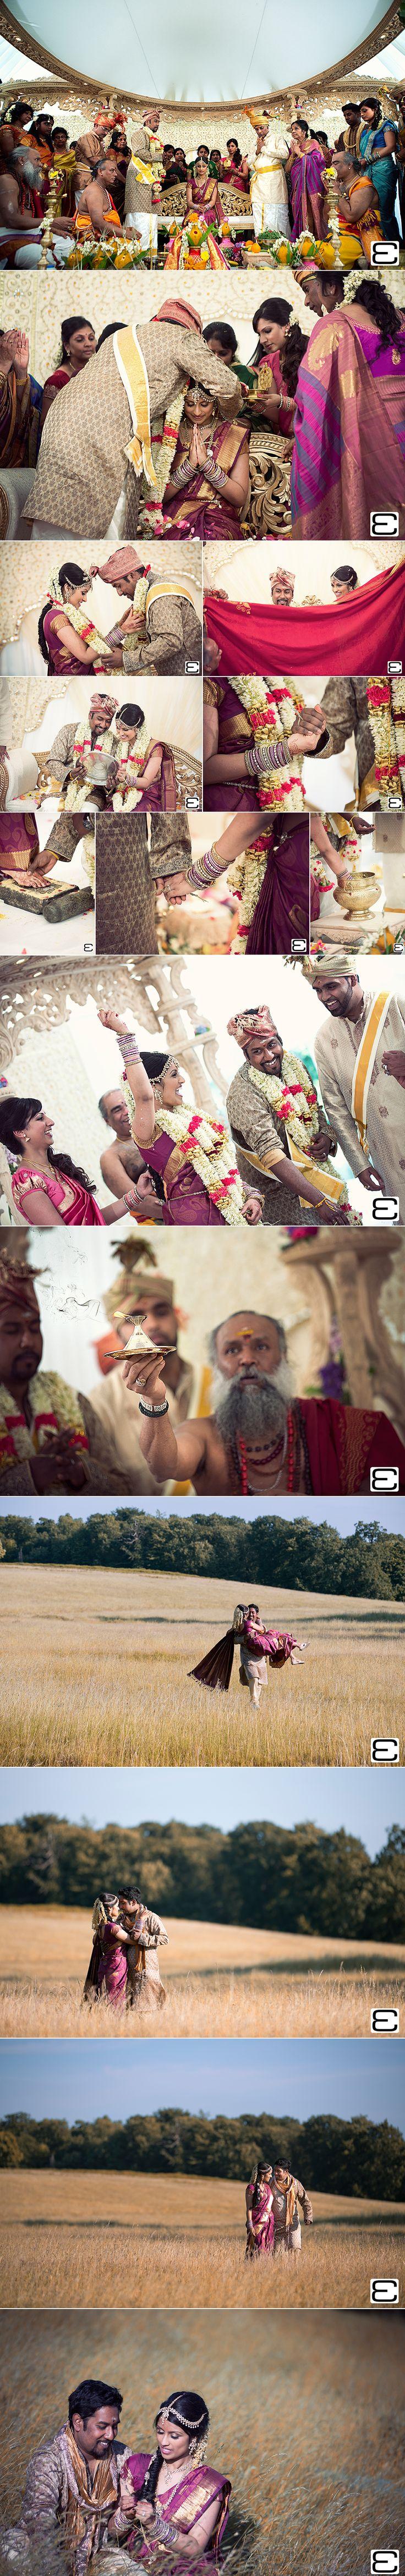 Tamil Wedding - Sav  Lavinia - Asian , Indian Wedding Photography And Videography | London